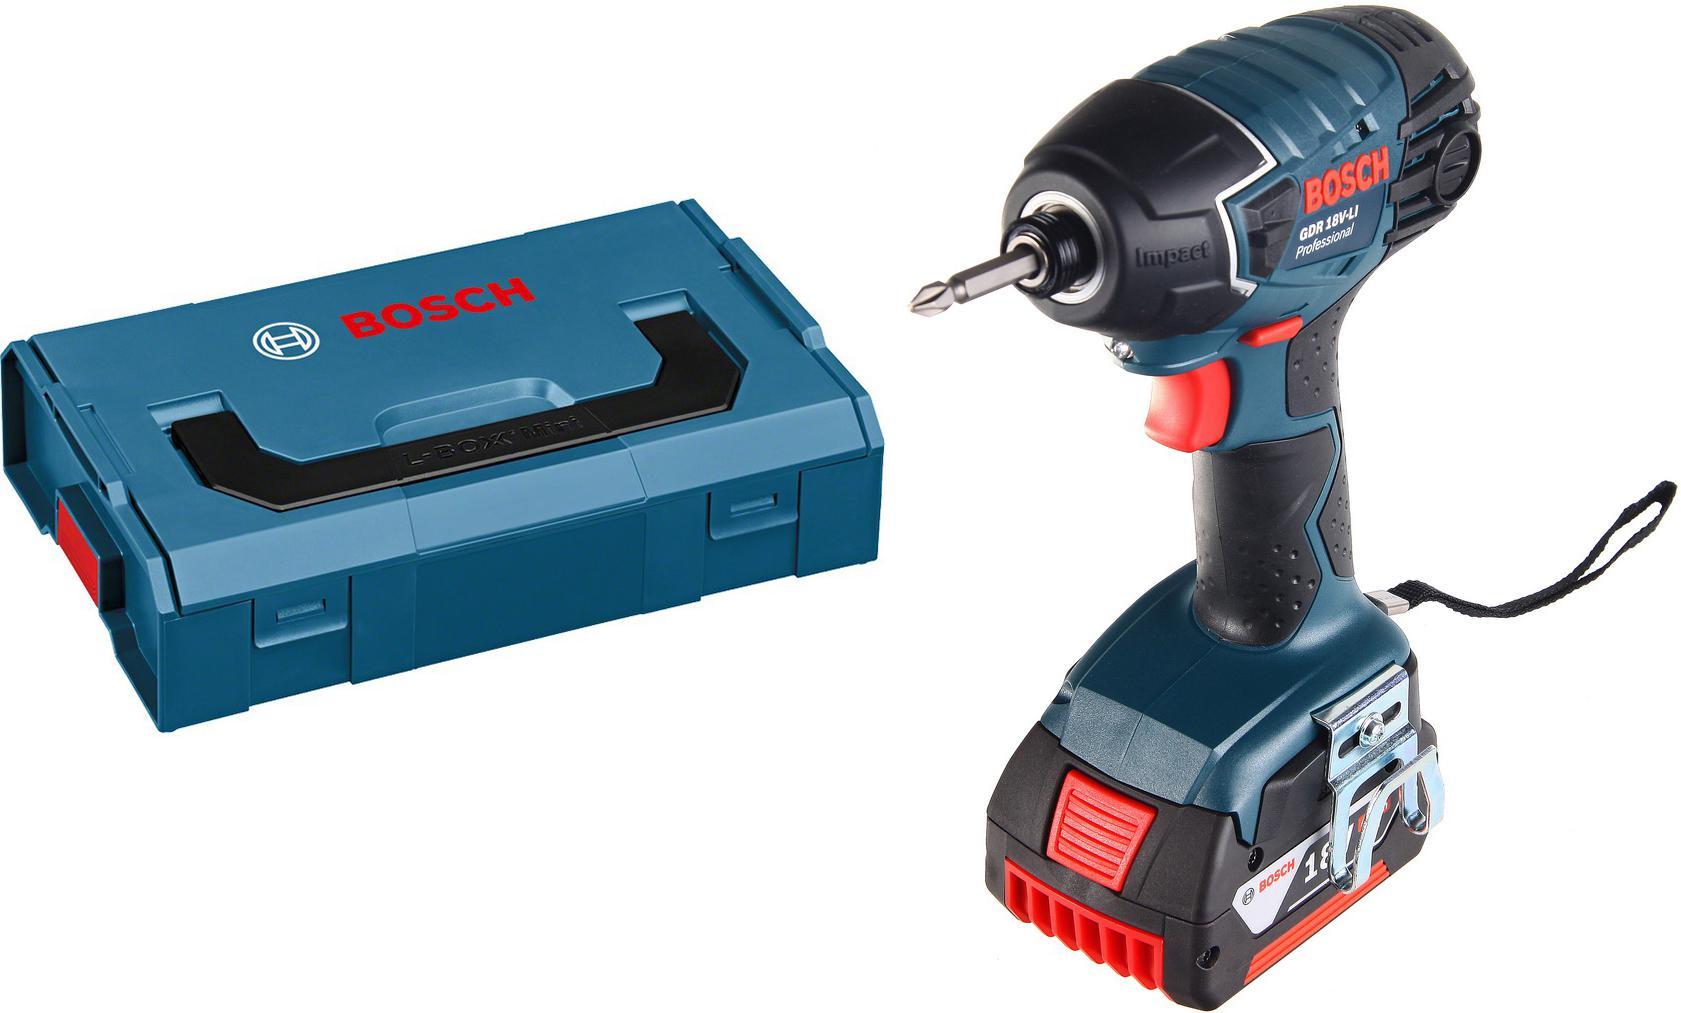 Набор Bosch Гайковерт аккумуляторный gdr 18 v-li 4.0Ач (0.601.9a1.30e) +Ящик l-boxx mini (1.600.a00.7sf), Гайковерт аккумуляторный gdr 18 v-li 4.0Ач (0.601.9a1.30e) +Ящик l-boxx mini (1.600.a00.7sf)